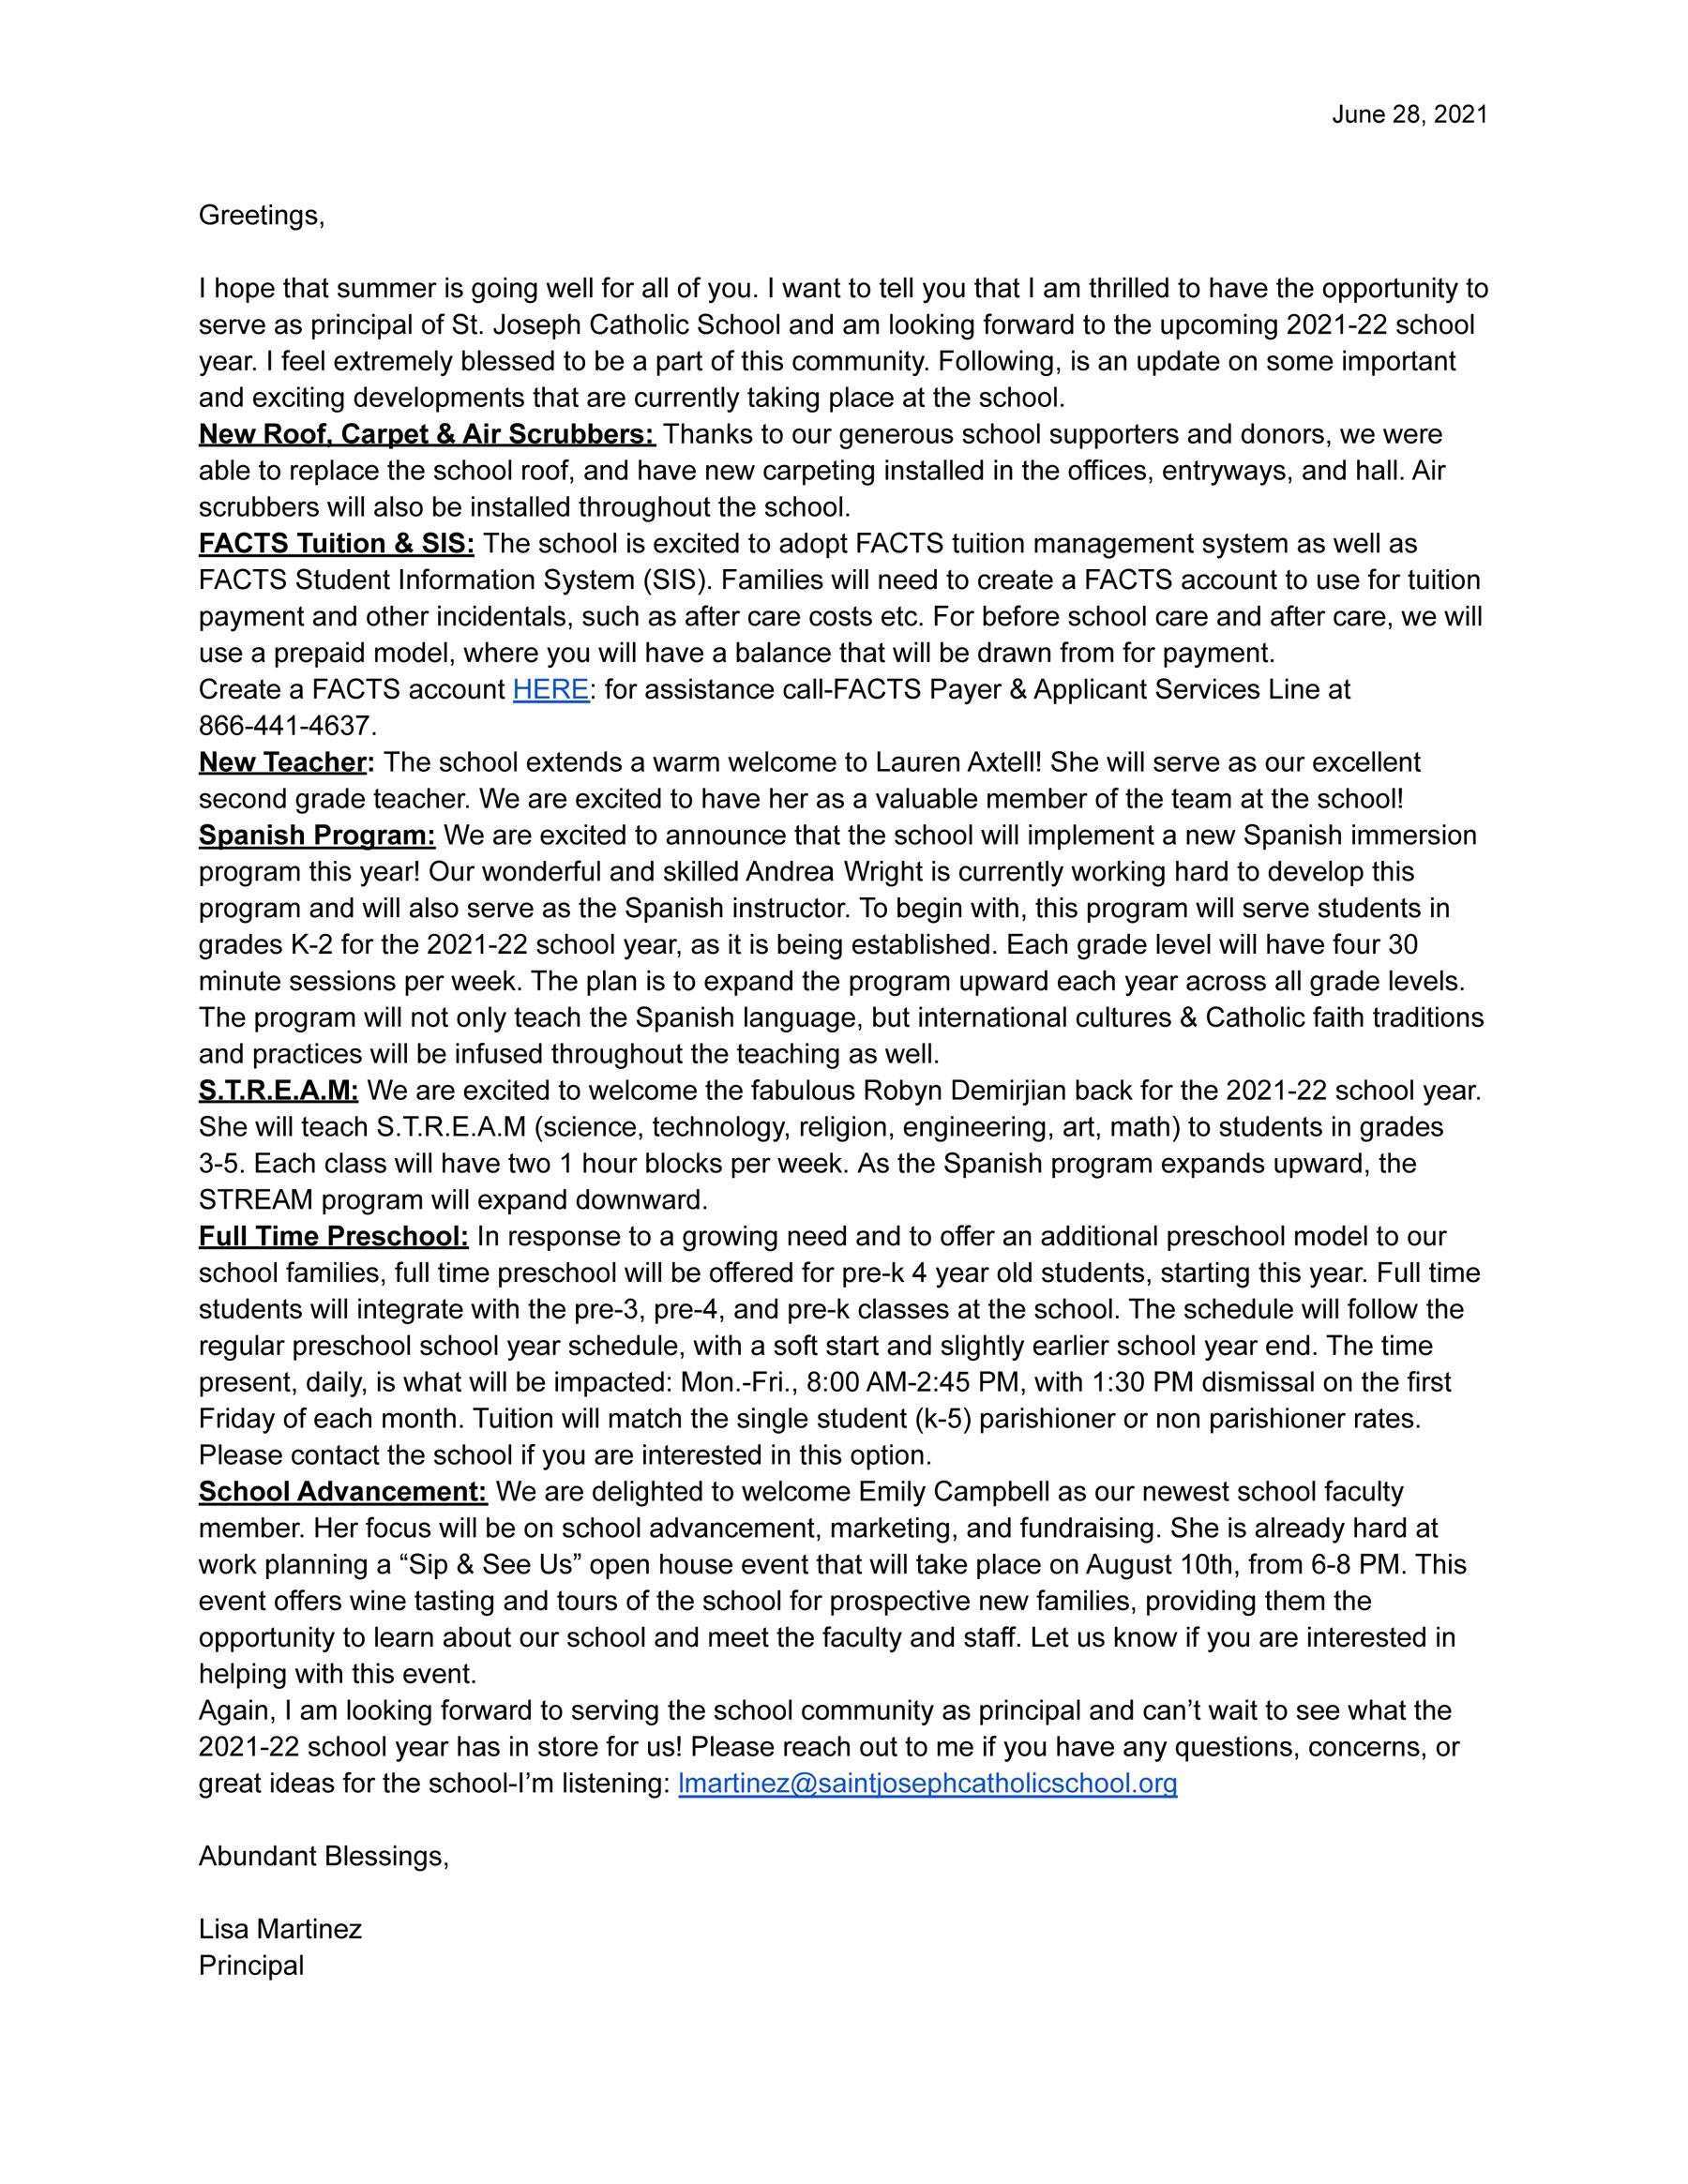 Parent Letter Summer 2021